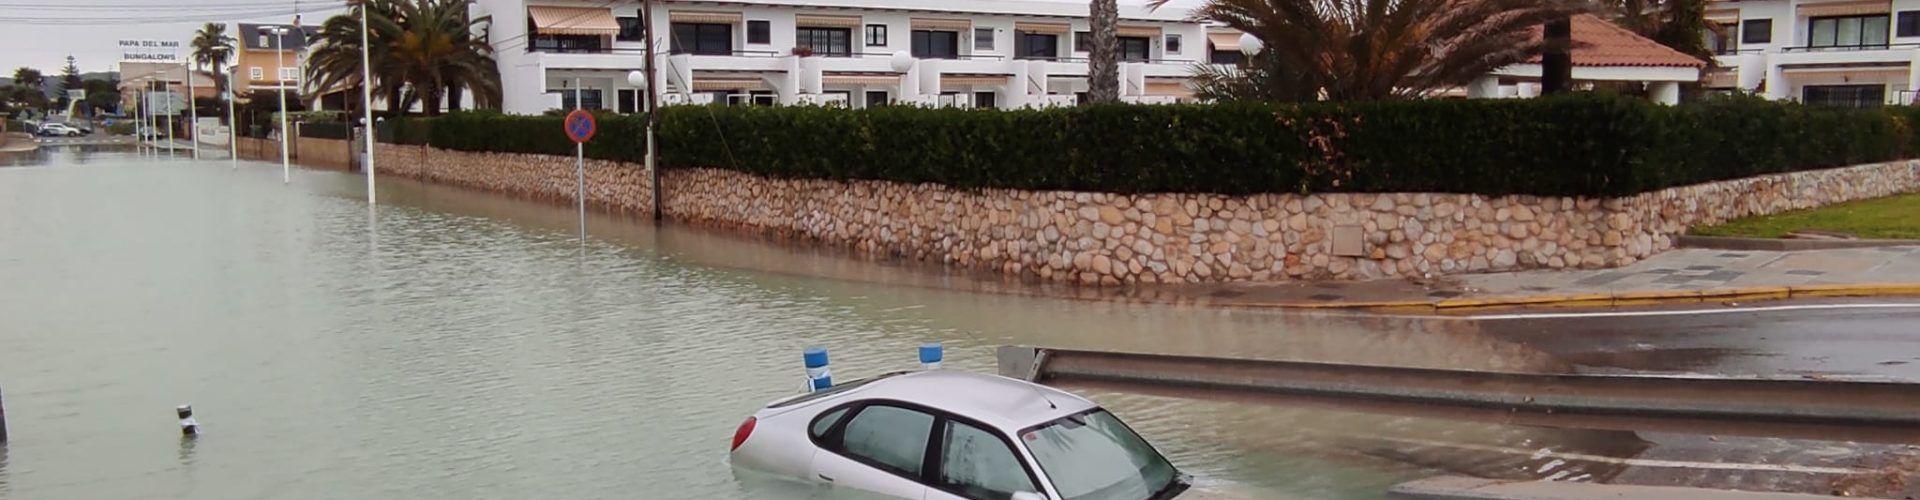 Fotos: el temporal a la costa de Benicarló